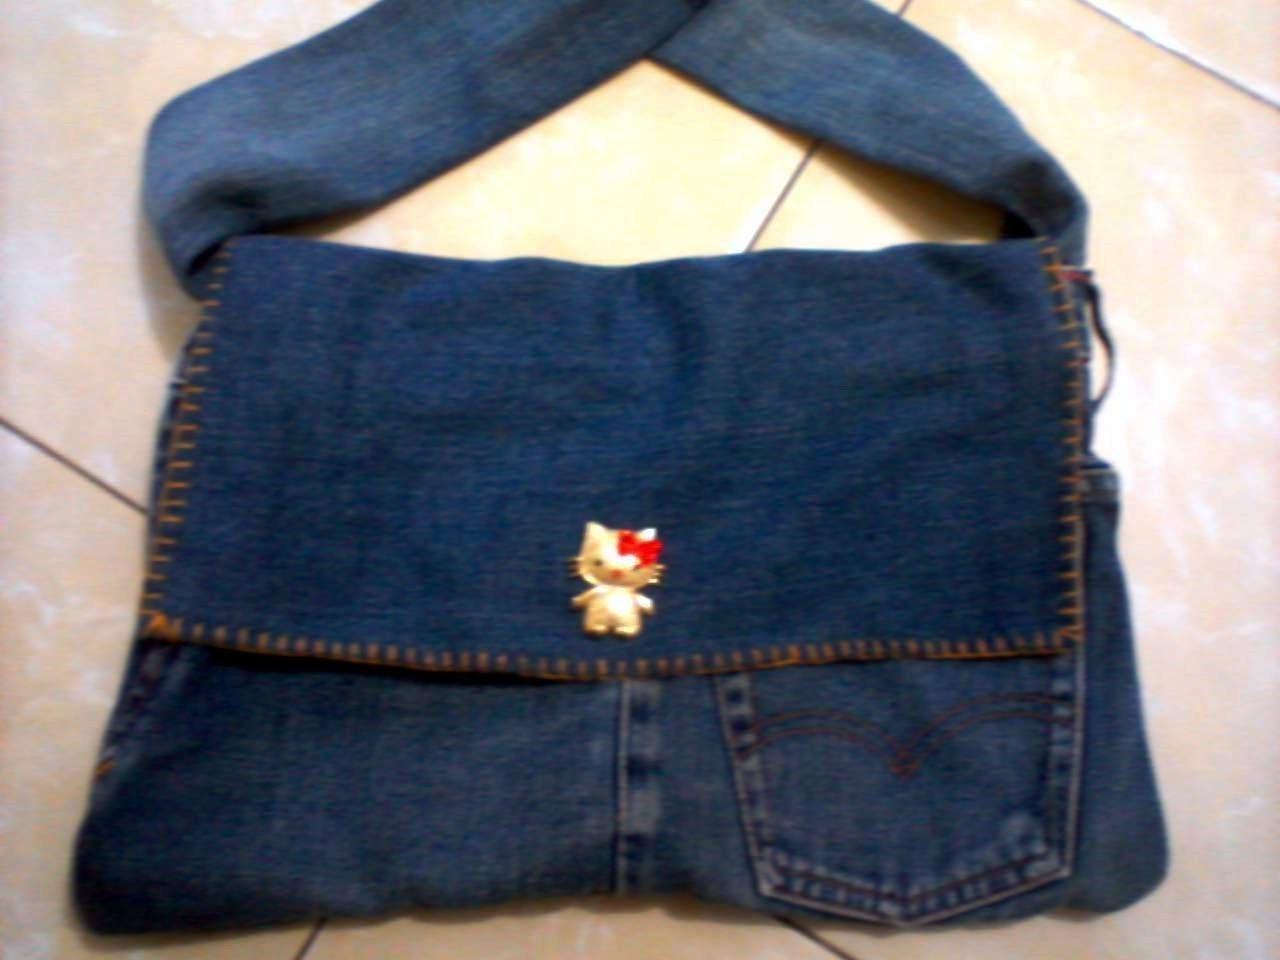 cb2d0f5a01 How To Make A Purse Out Of Old Jeans - Best Purse Image Ccdbb.Org